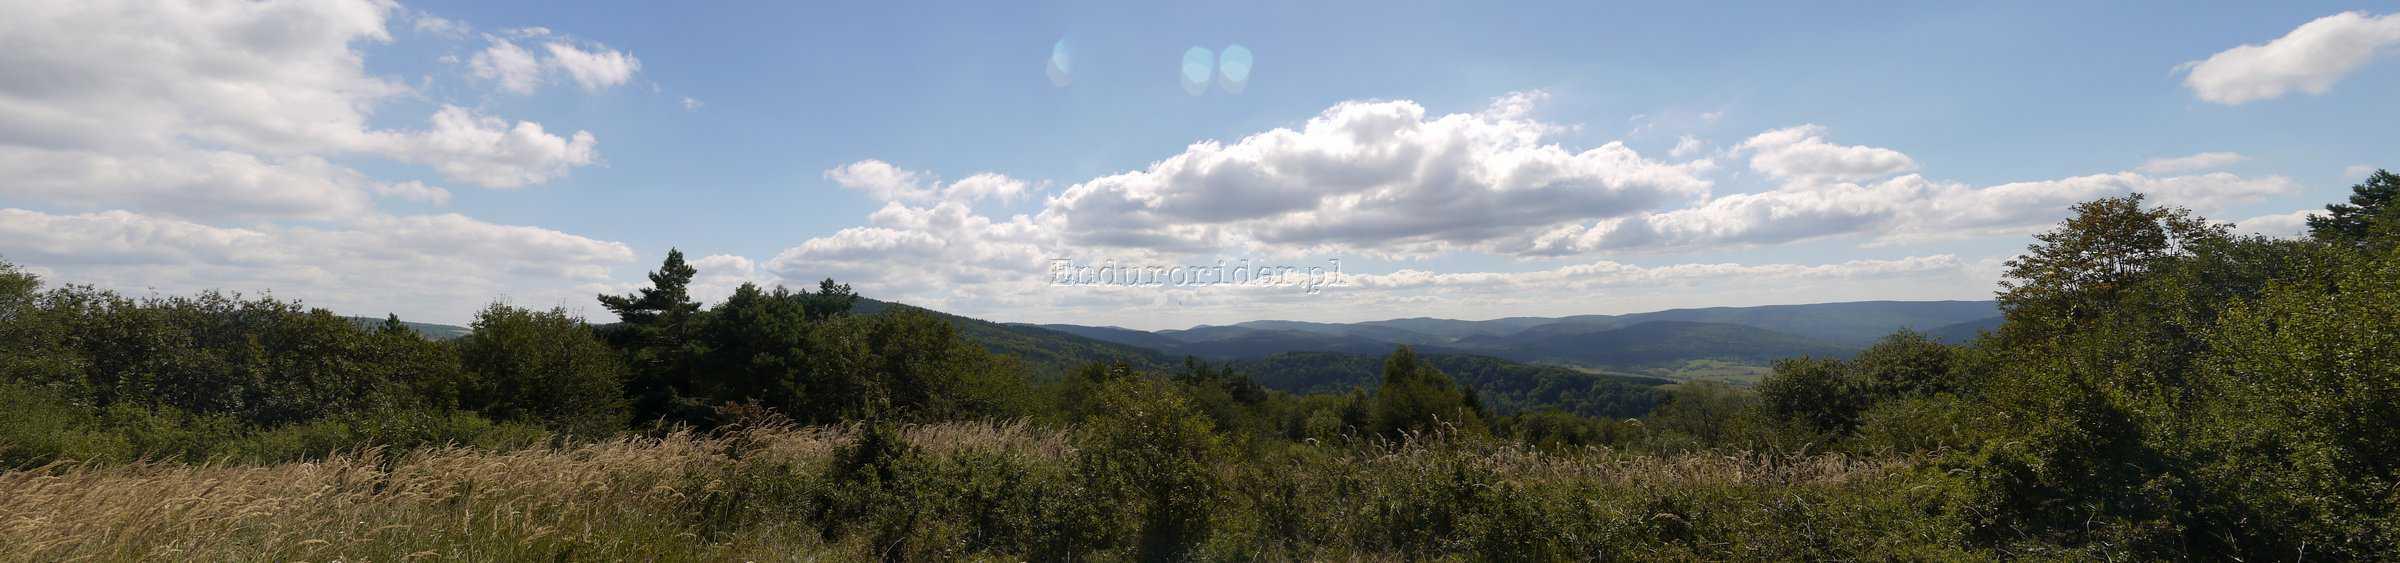 P1050560 Panorama